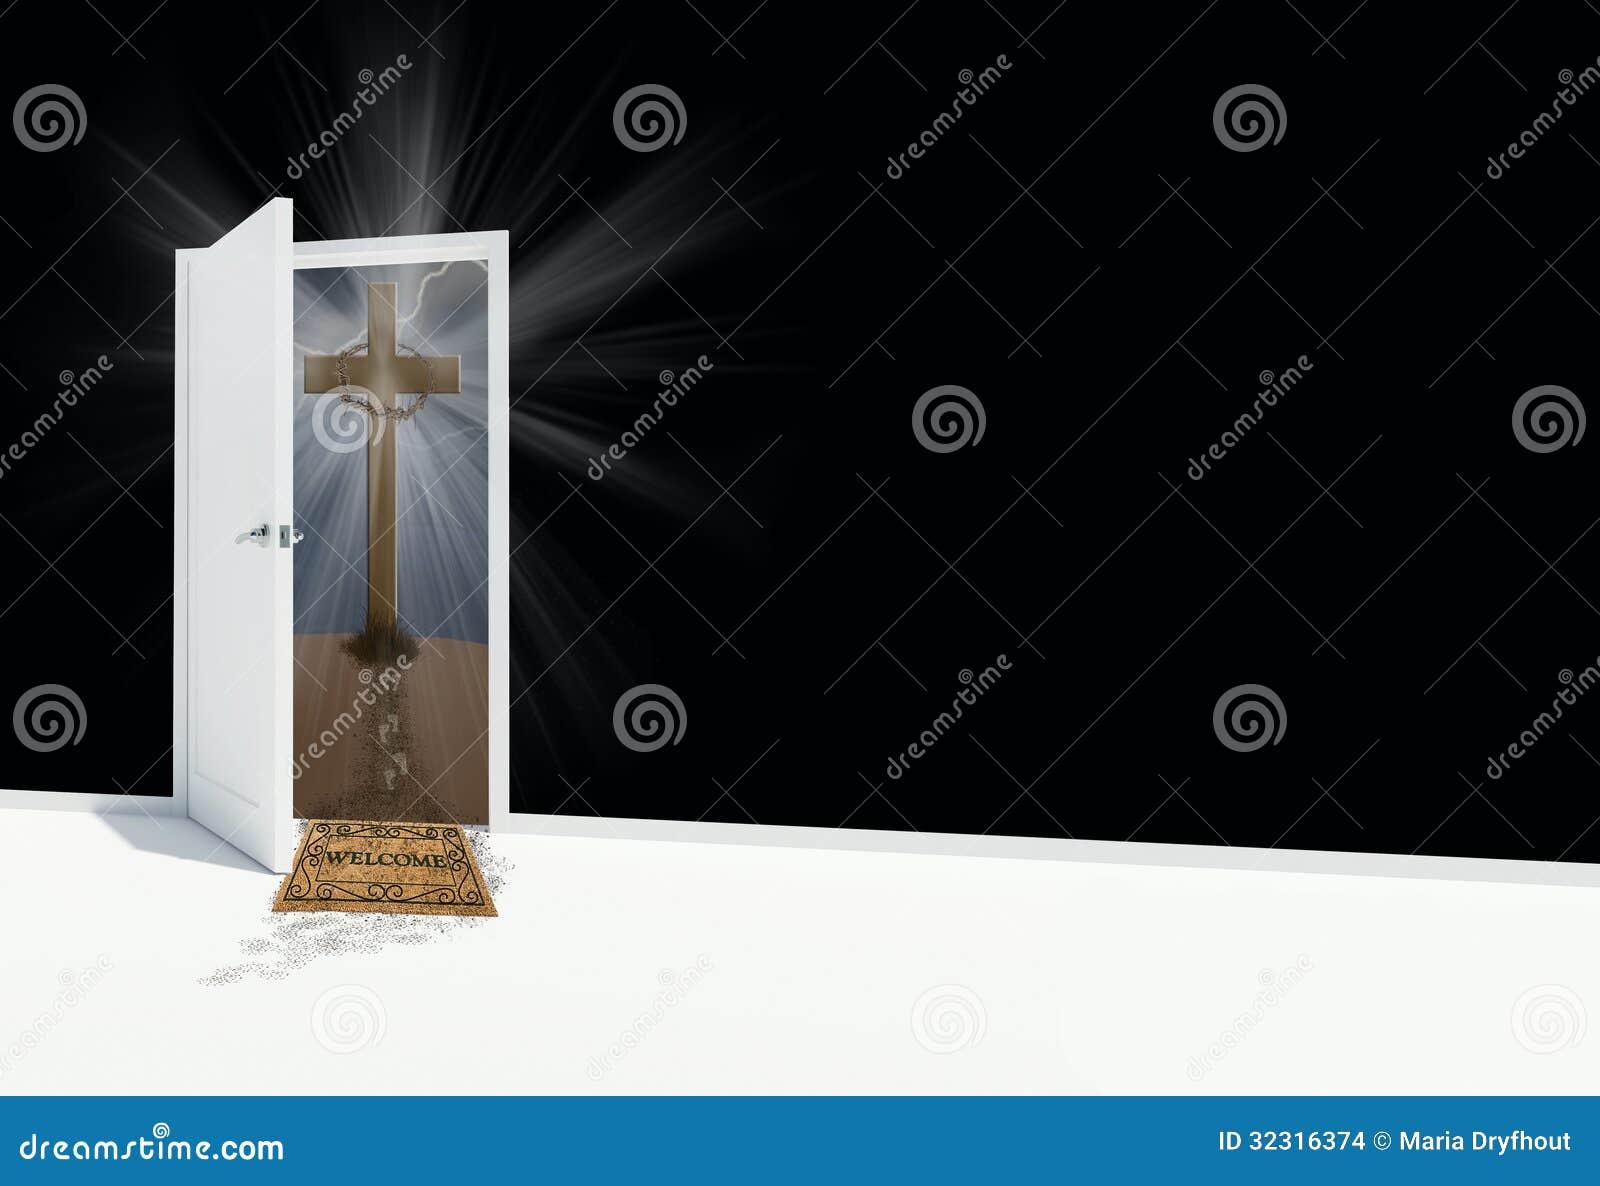 White open door with religious cross and welcome mat Open Door Welcome Mat